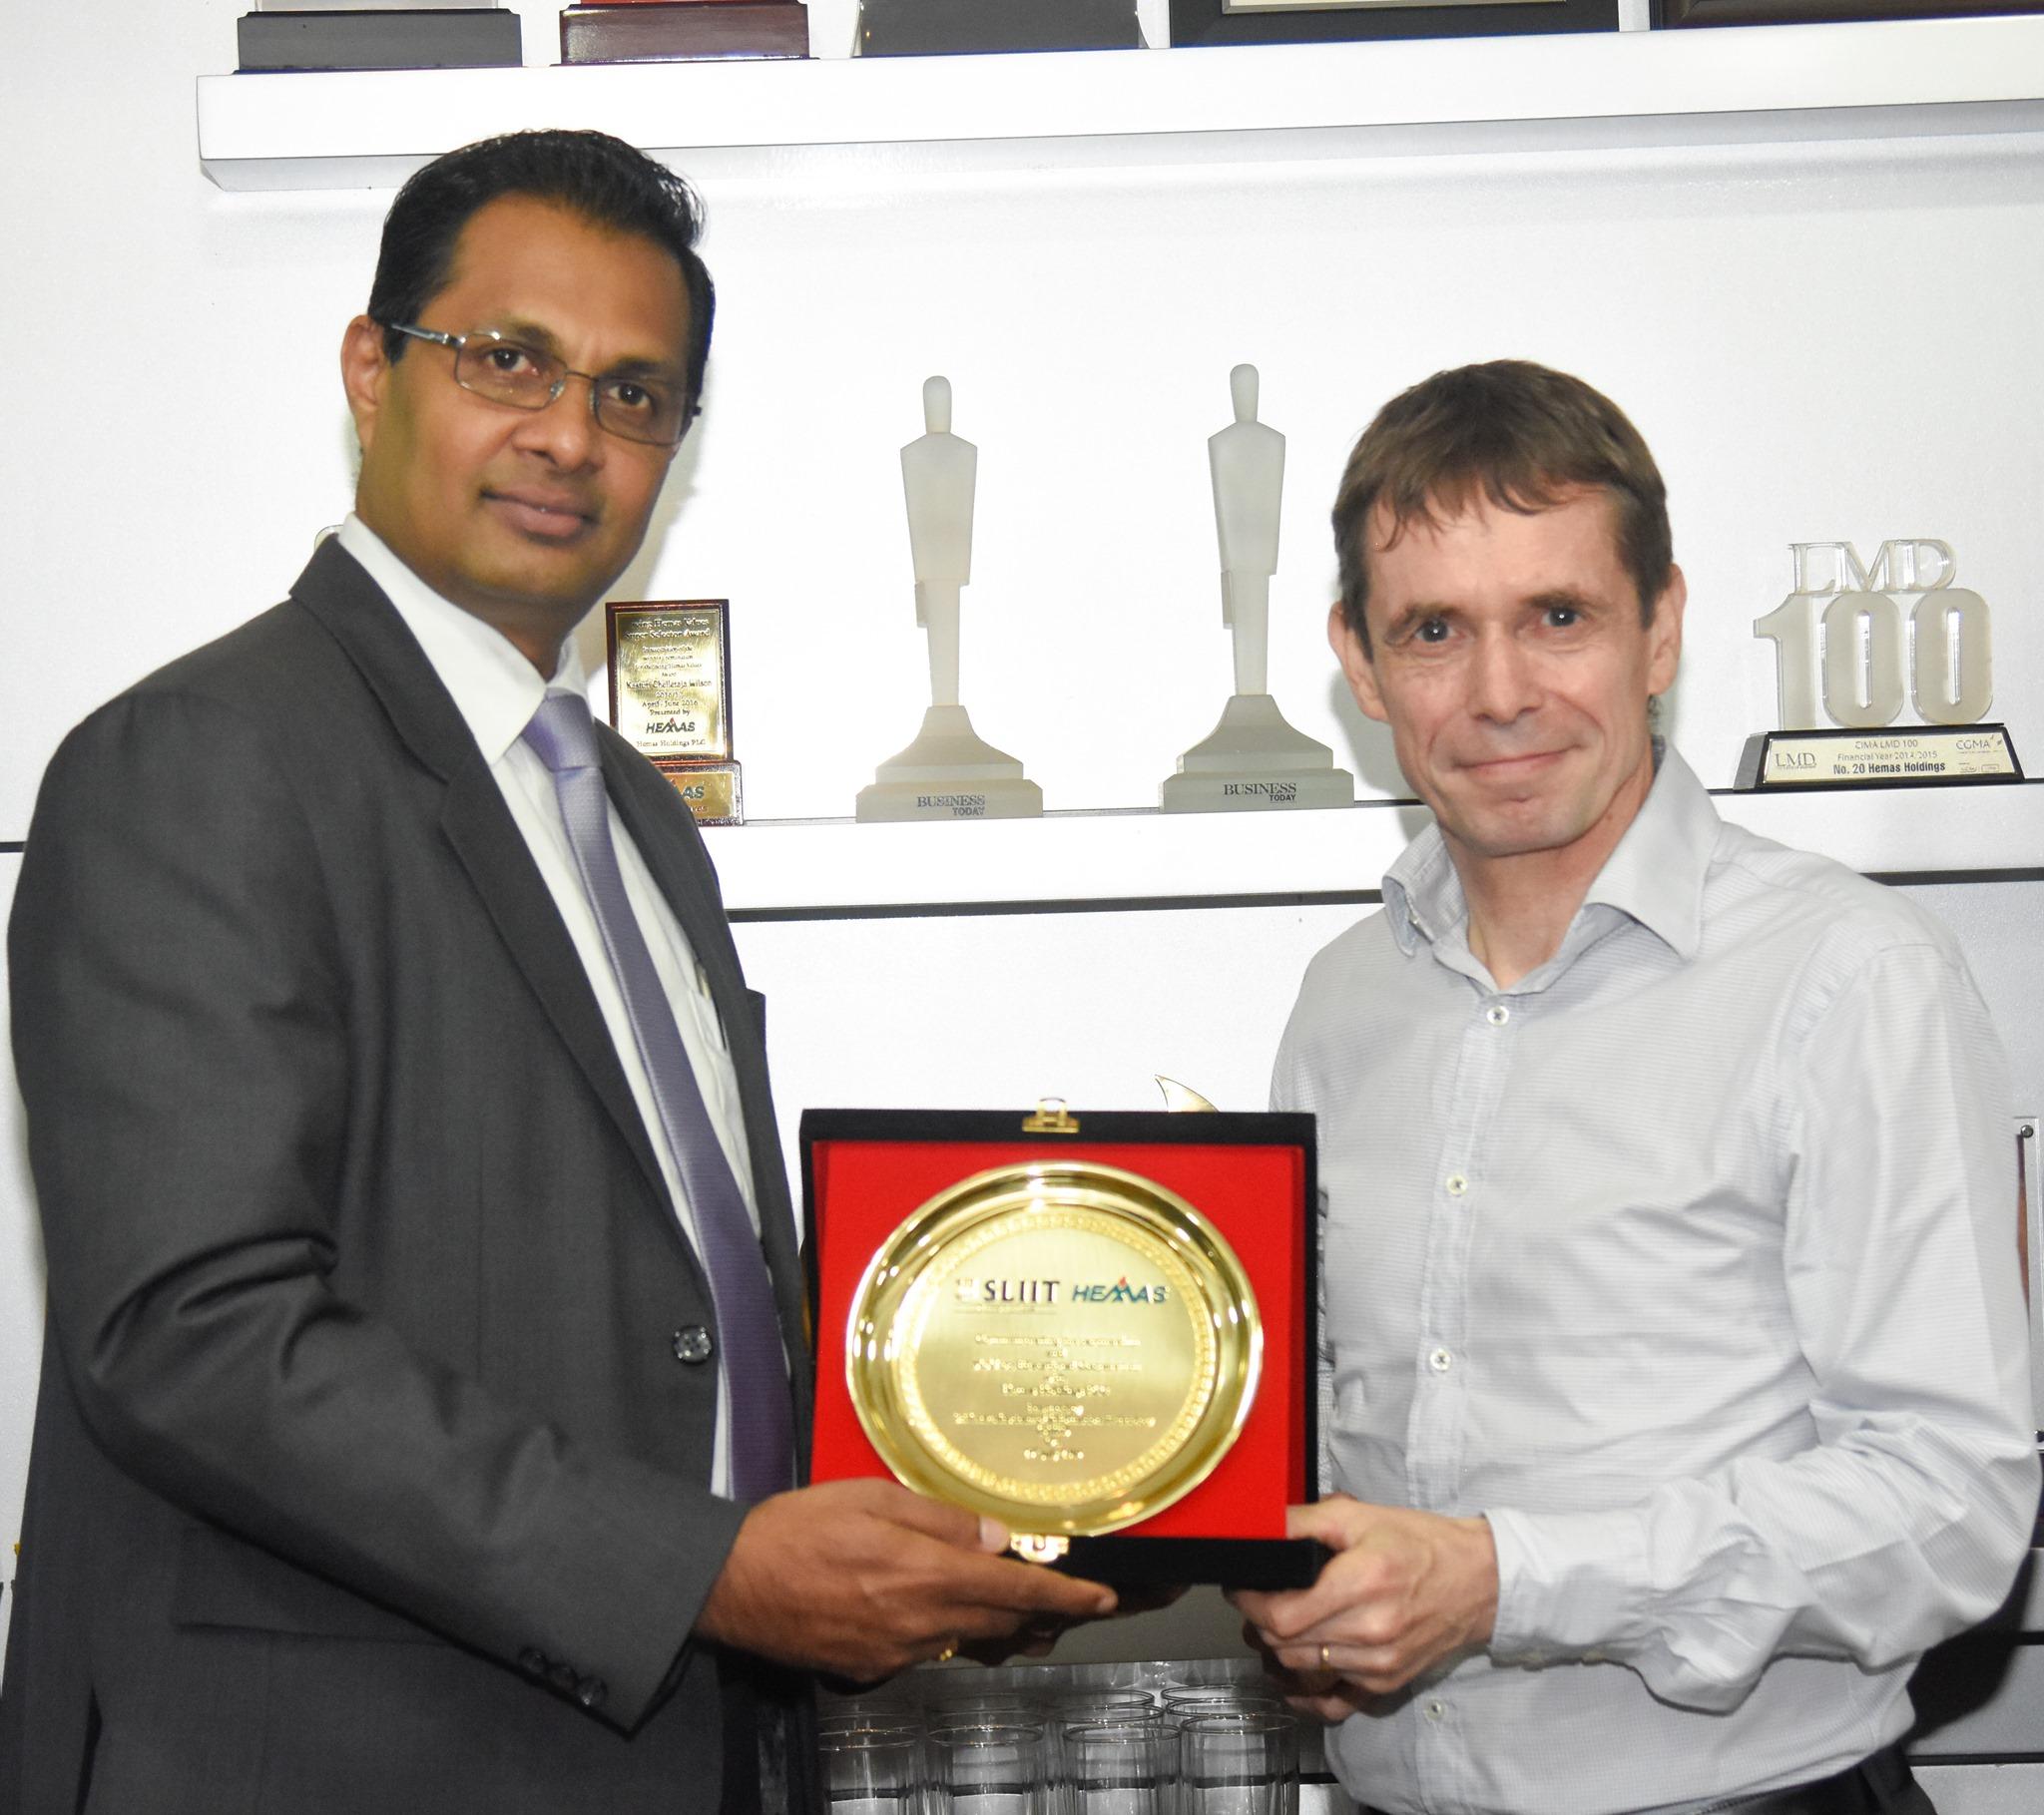 SLIIT-Business-School-Strengthens-their-partnership-with-Hemas-Holdings-PLC-